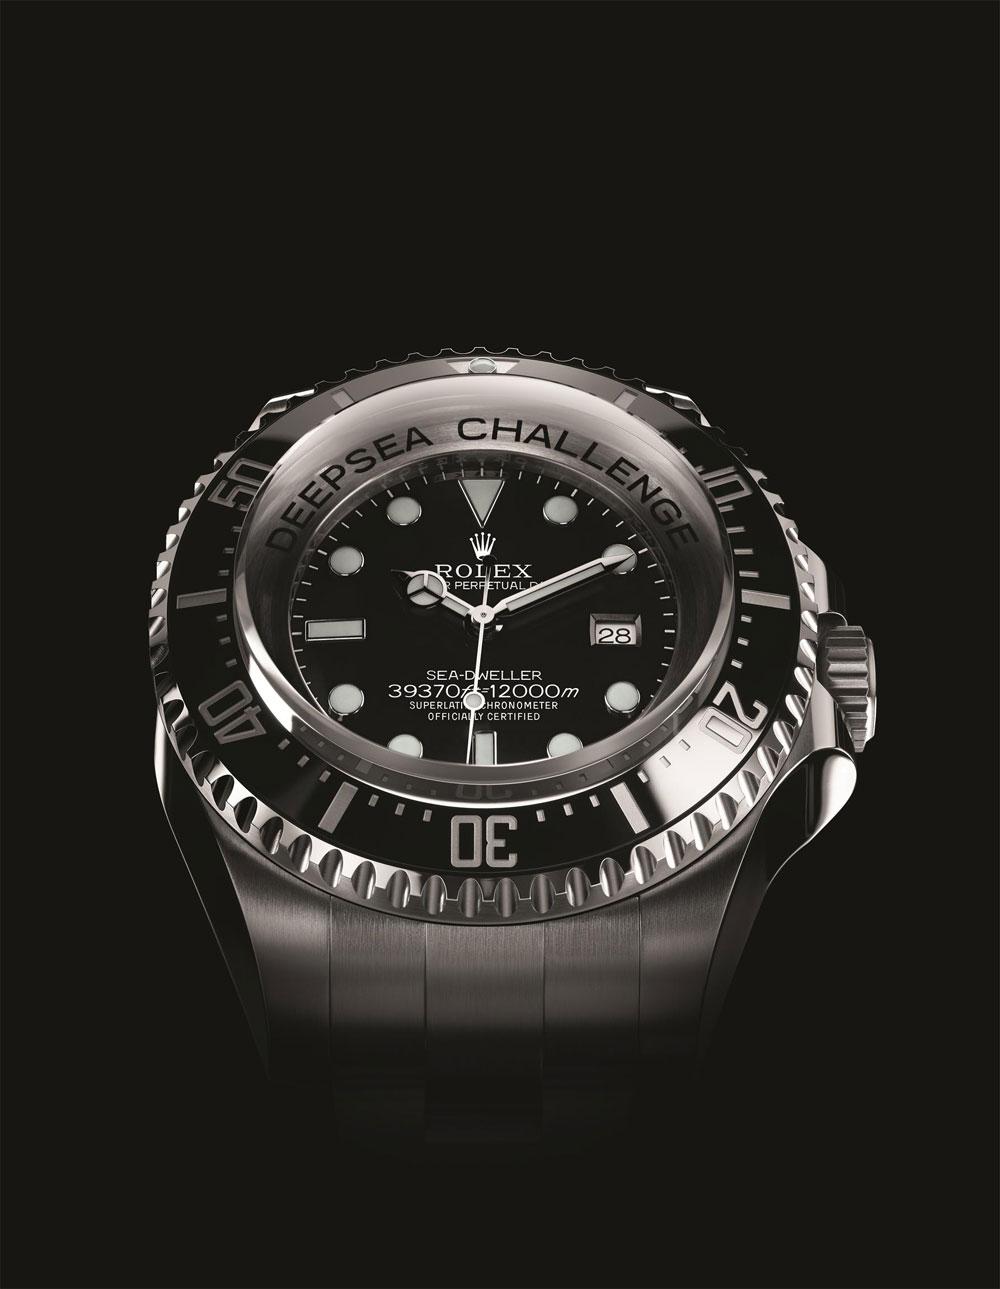 Reloj Rolex Oyster Perpetual Deep Sea Challenge